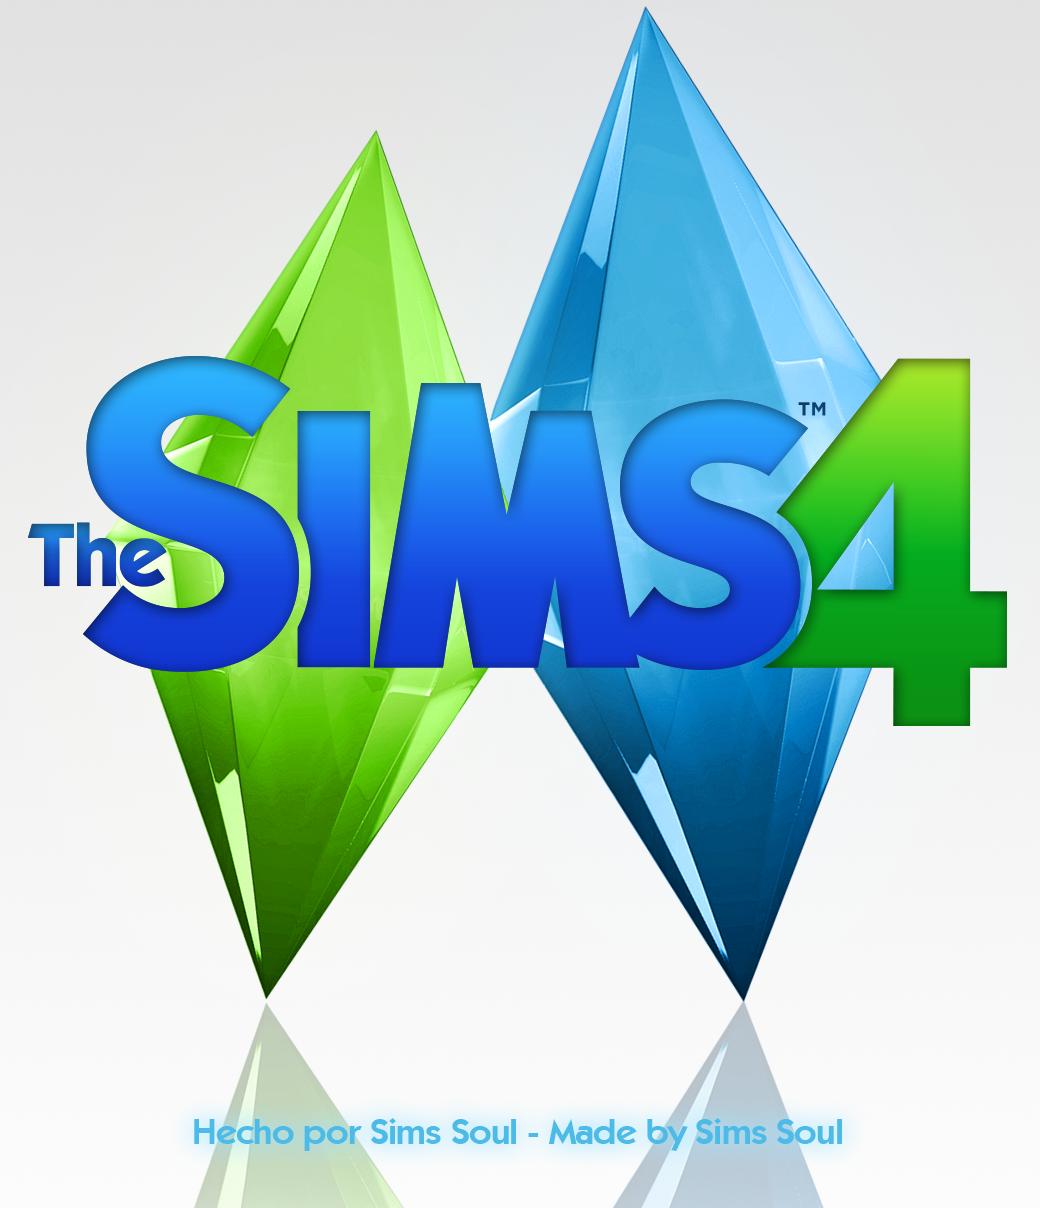 Sims 4 Logo Google Search Sims Sims 4 Nerd Pride